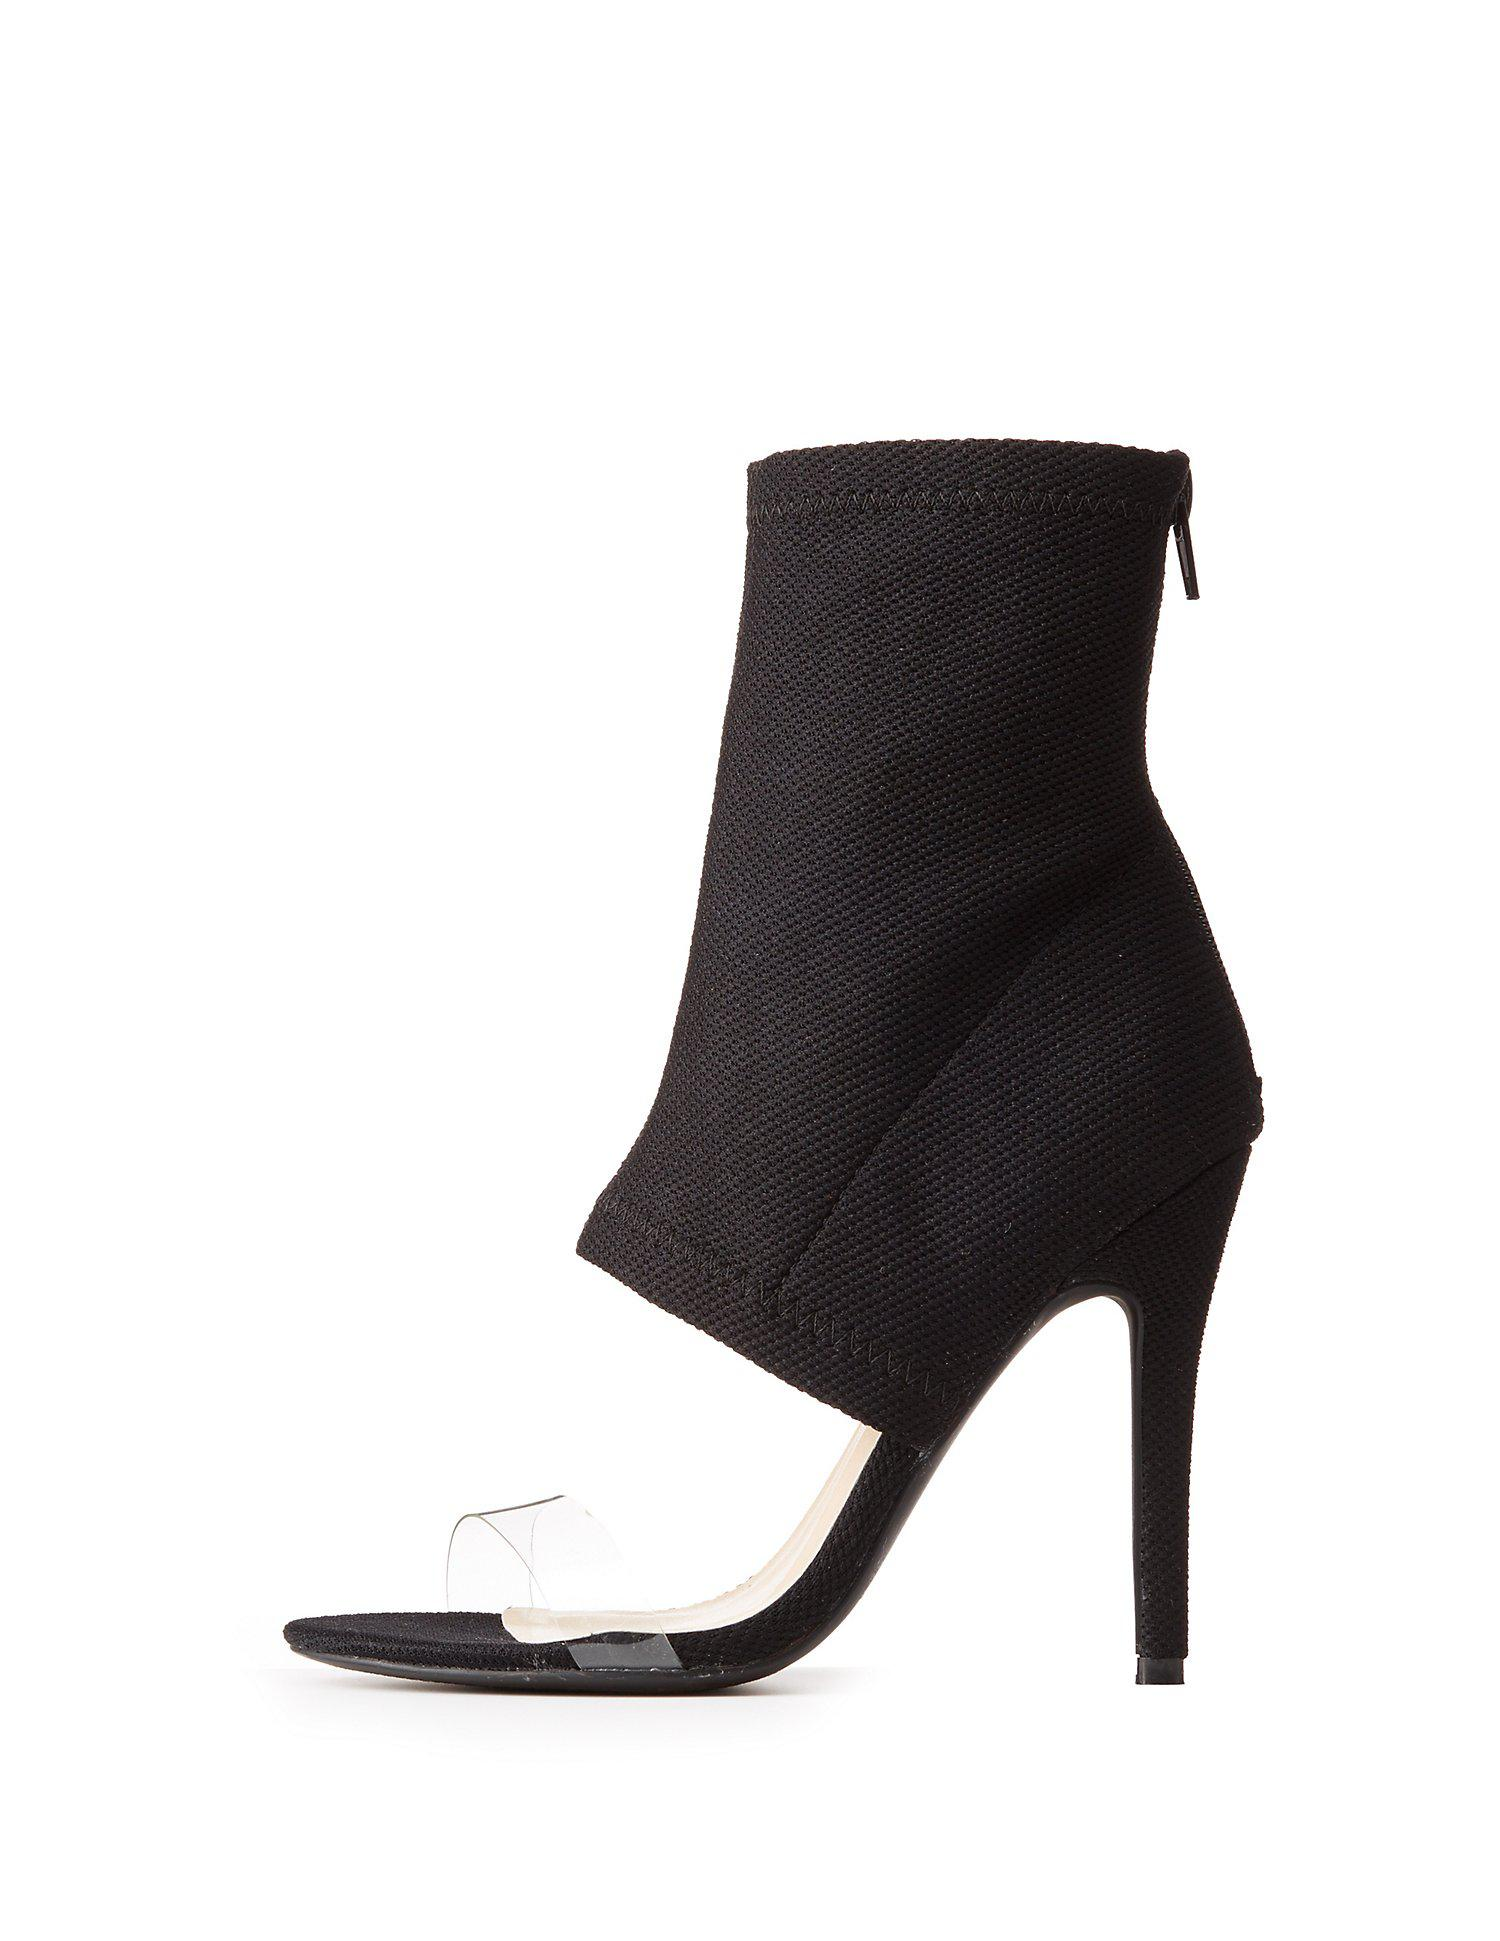 806883d1bef Lyst - Charlotte Russe Clear Strap Knit Sock Heels in Black